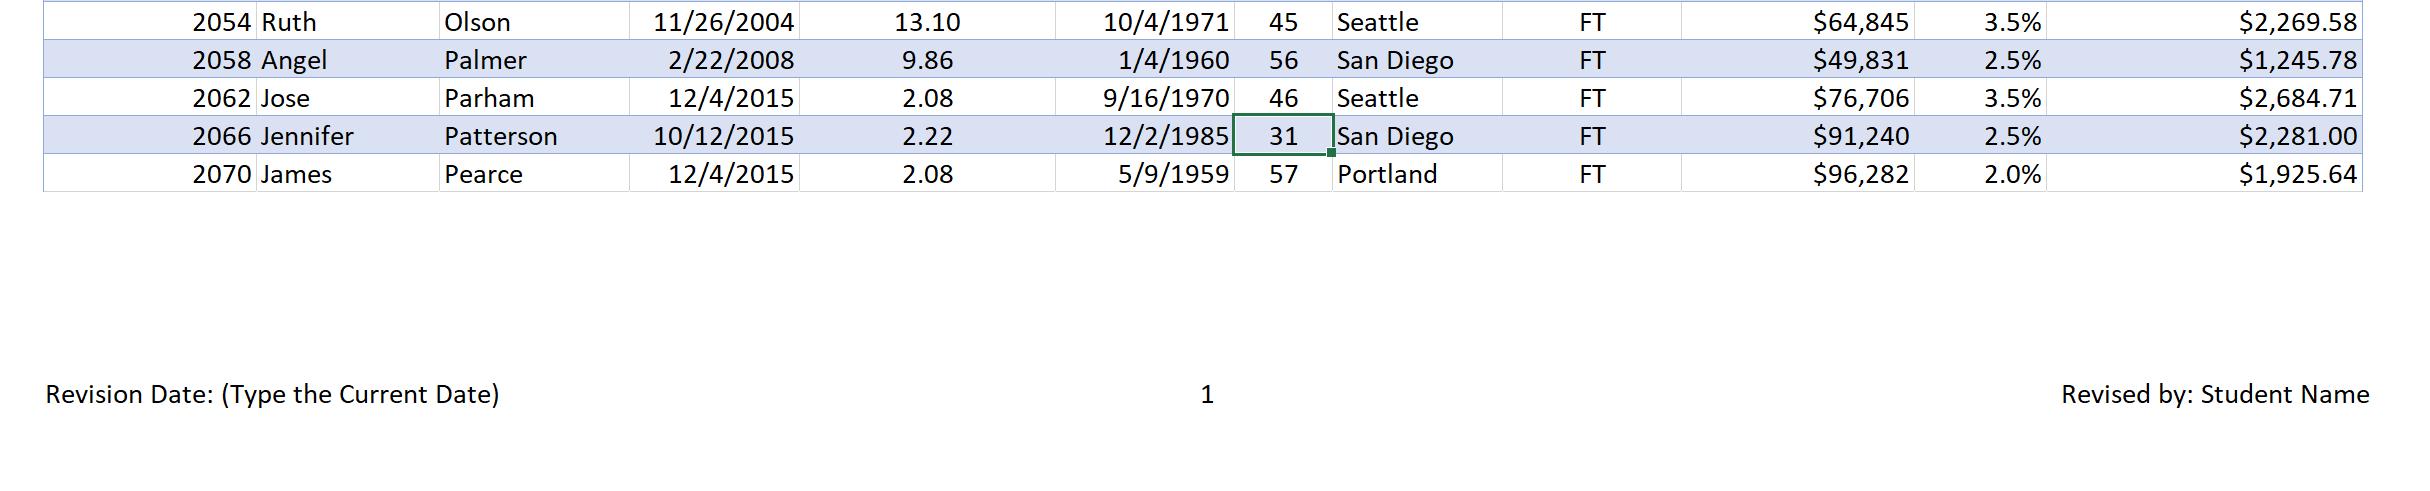 Screenshot of the Footer section in the EmployeeData sheet